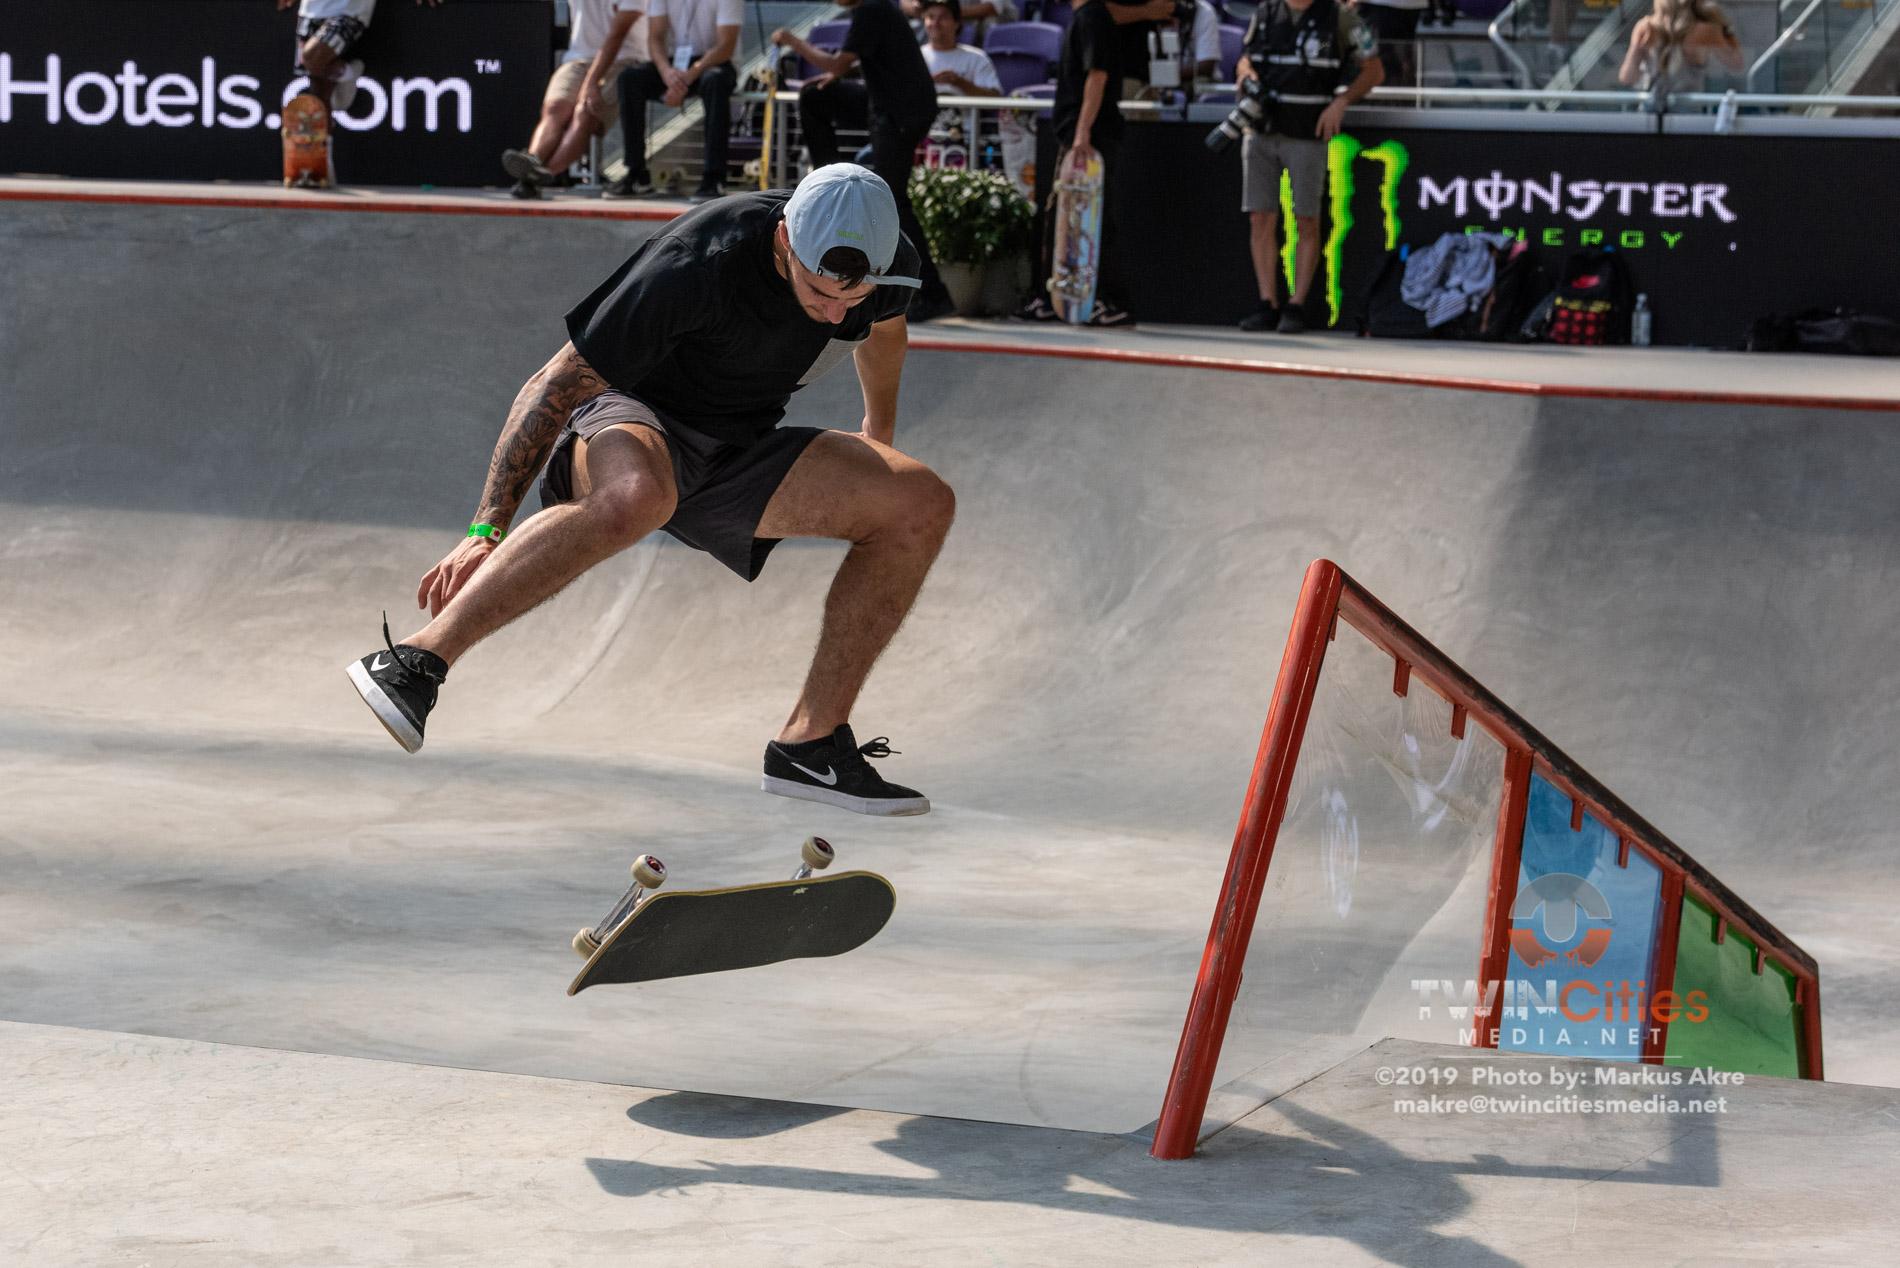 2019-X-Games-Day-1-Skate-Elims-6